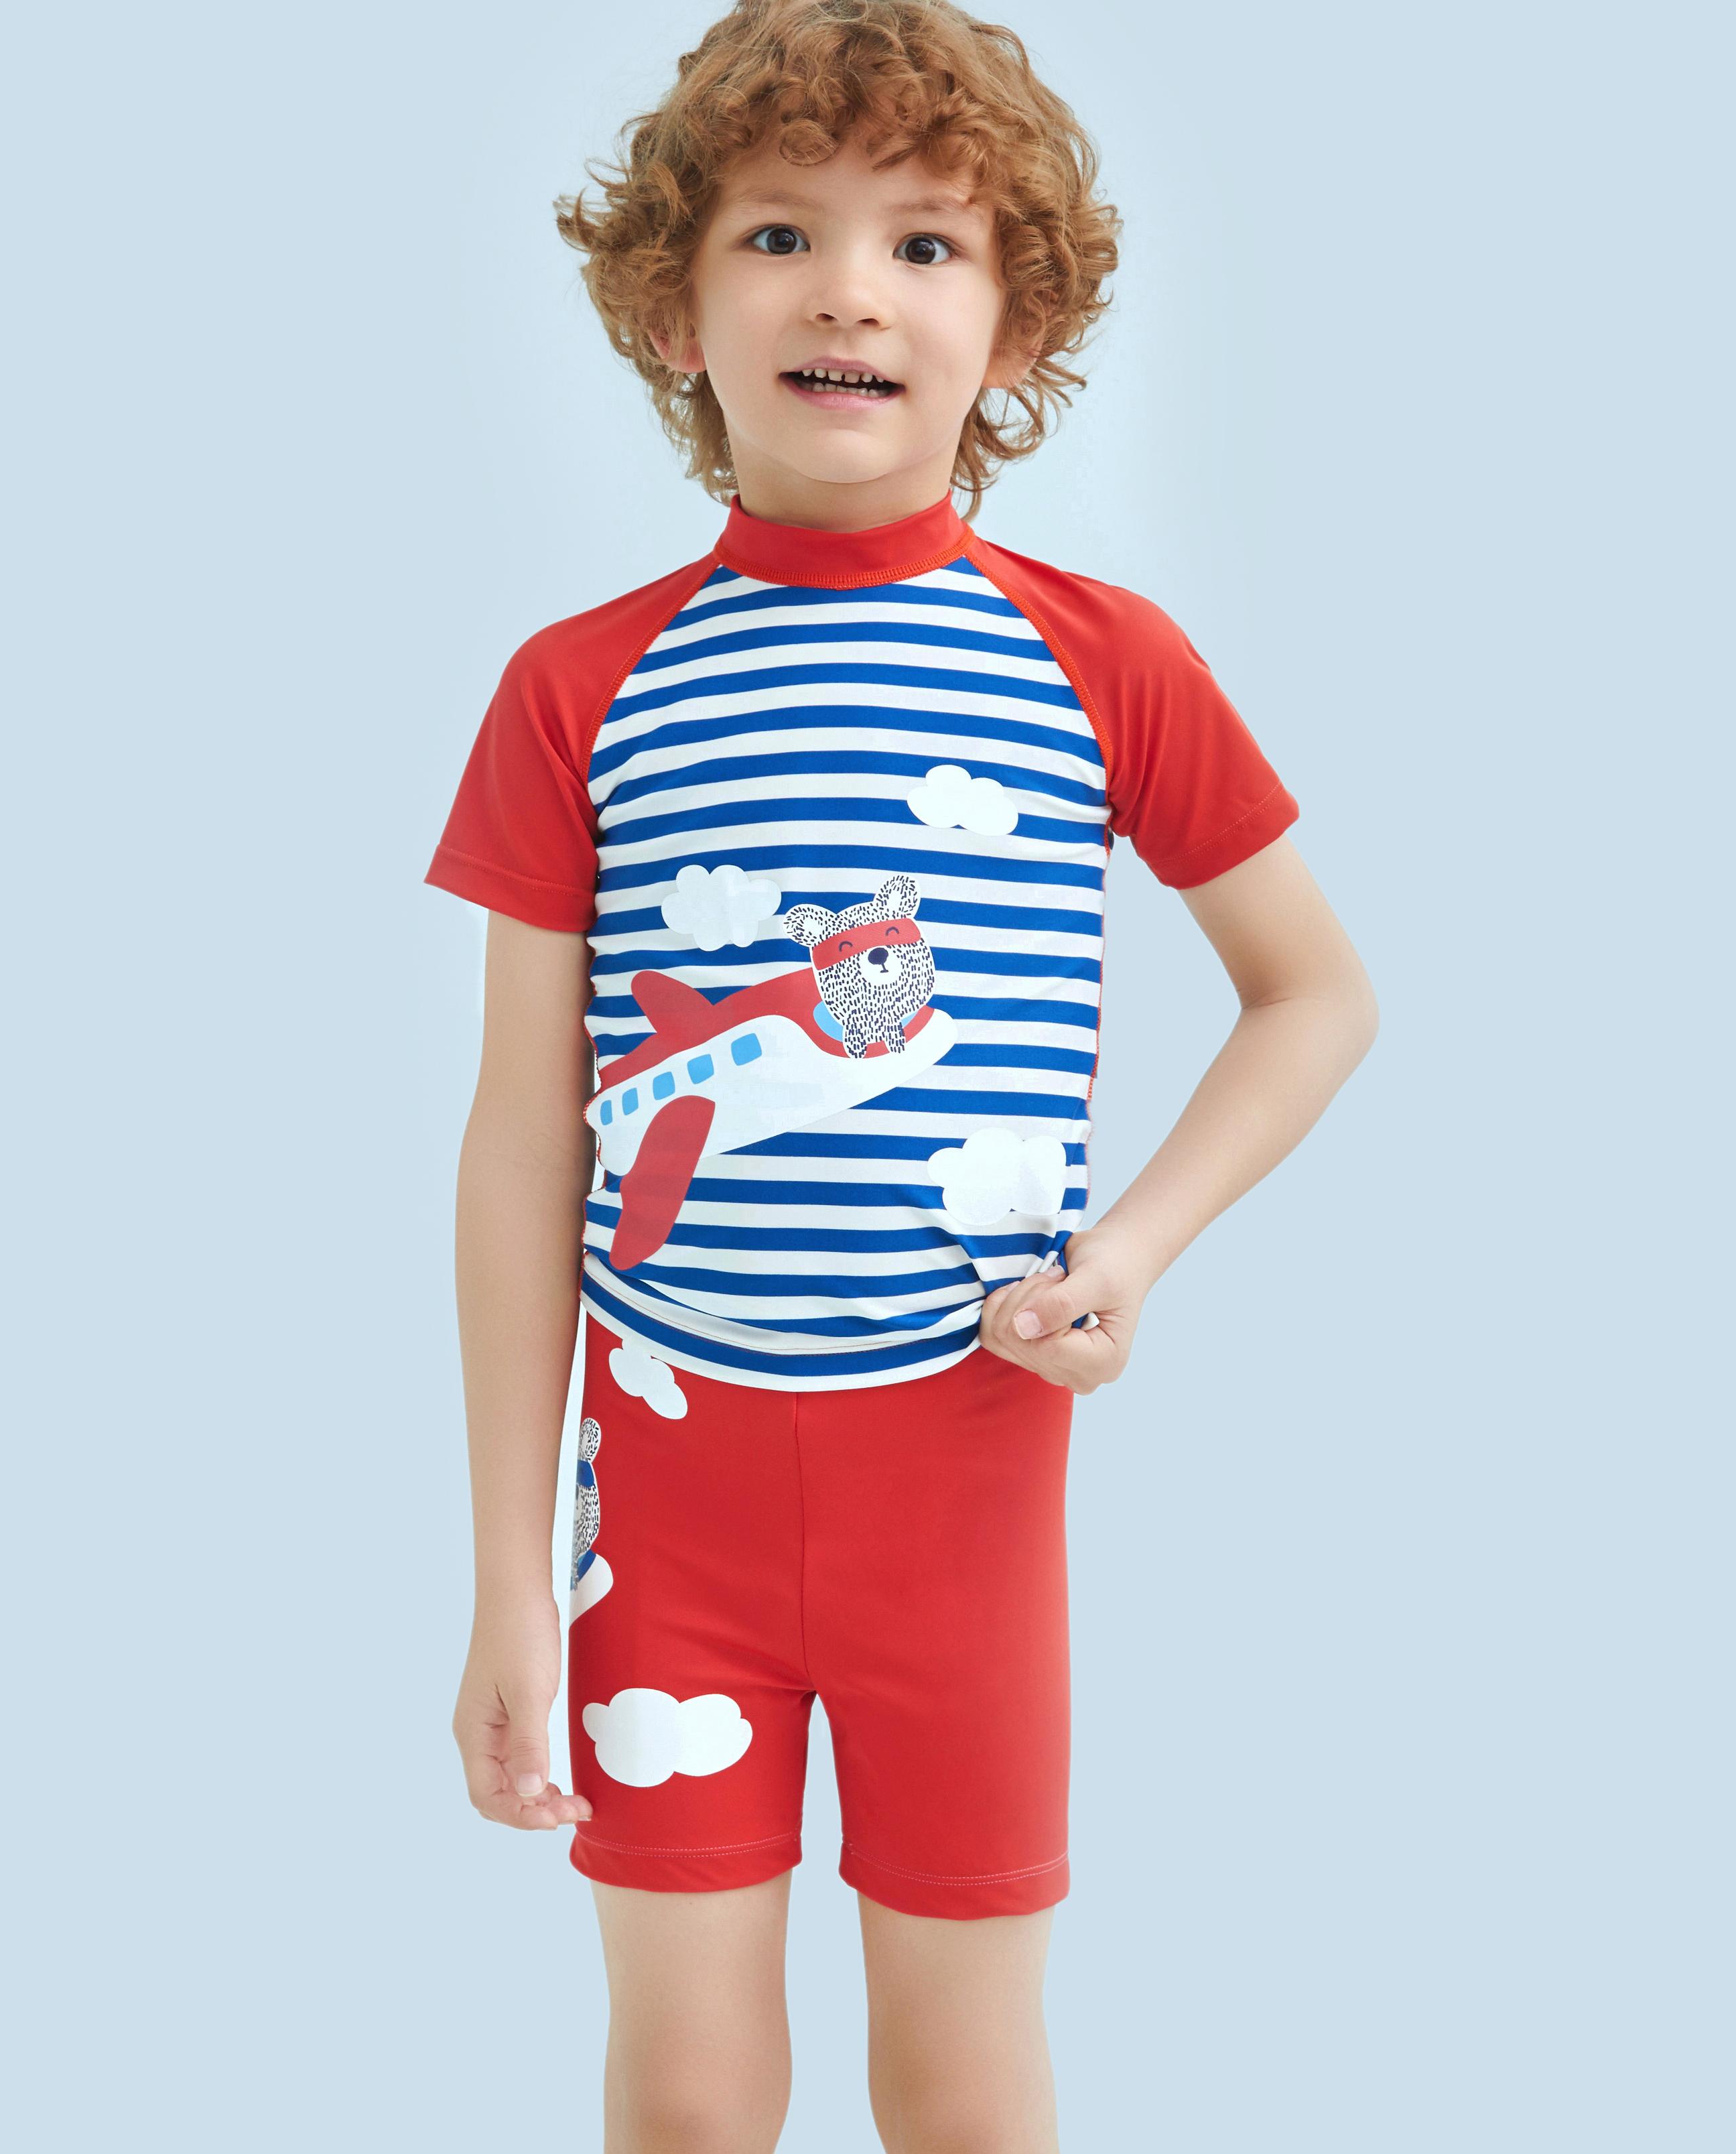 Aimer Kids泳衣|爱慕儿童条纹飞机泳裤AK2671562